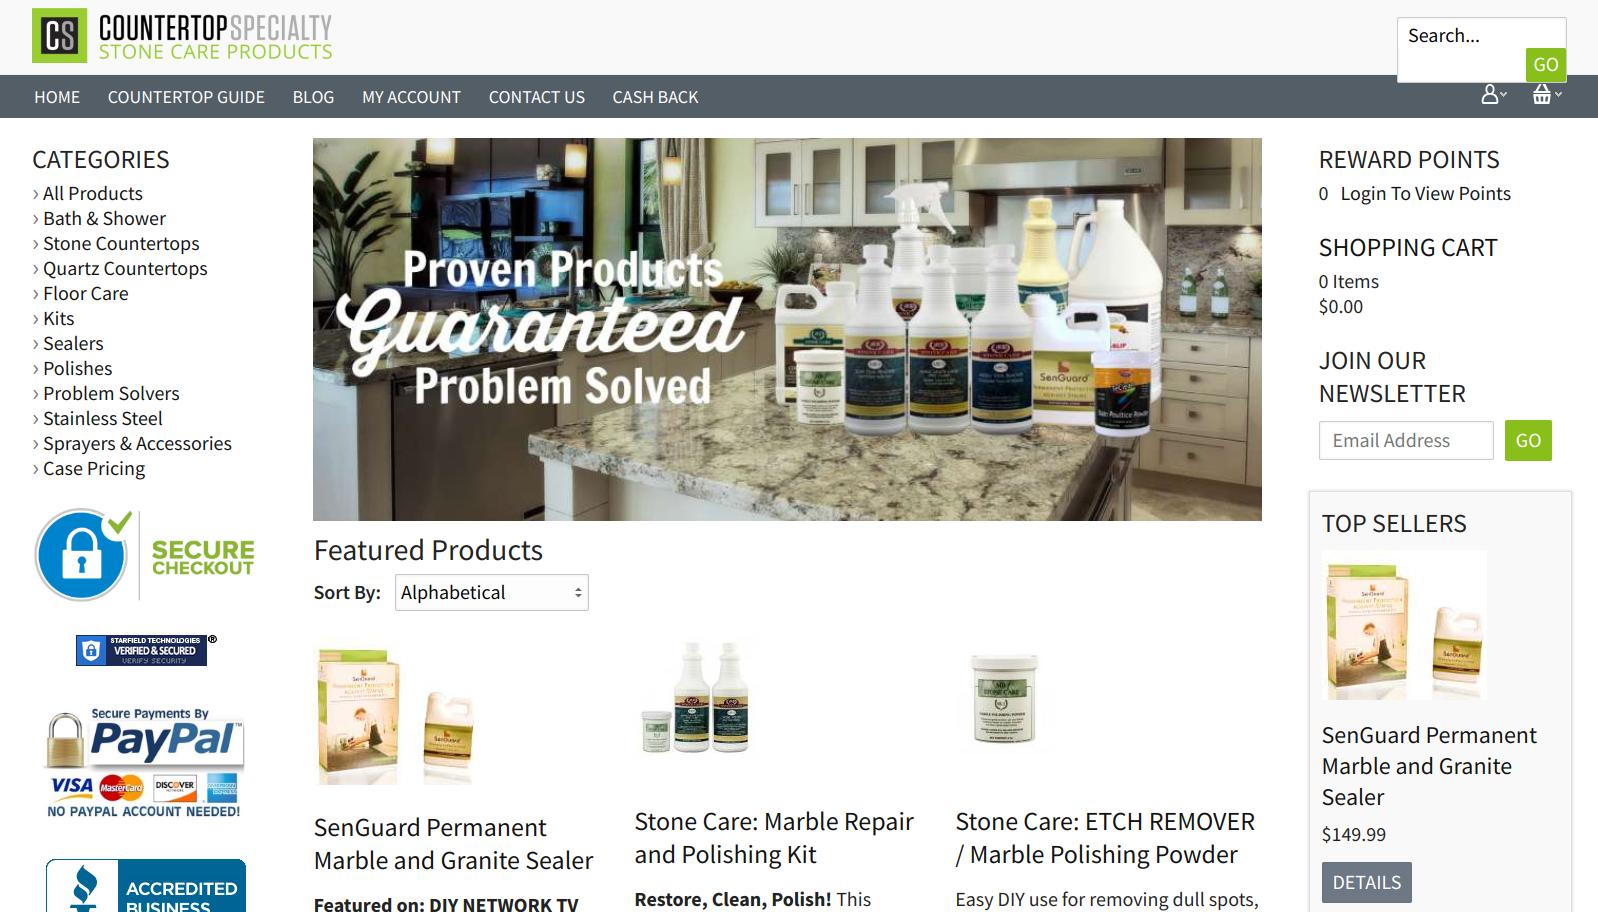 Countertop Specialty - niche market